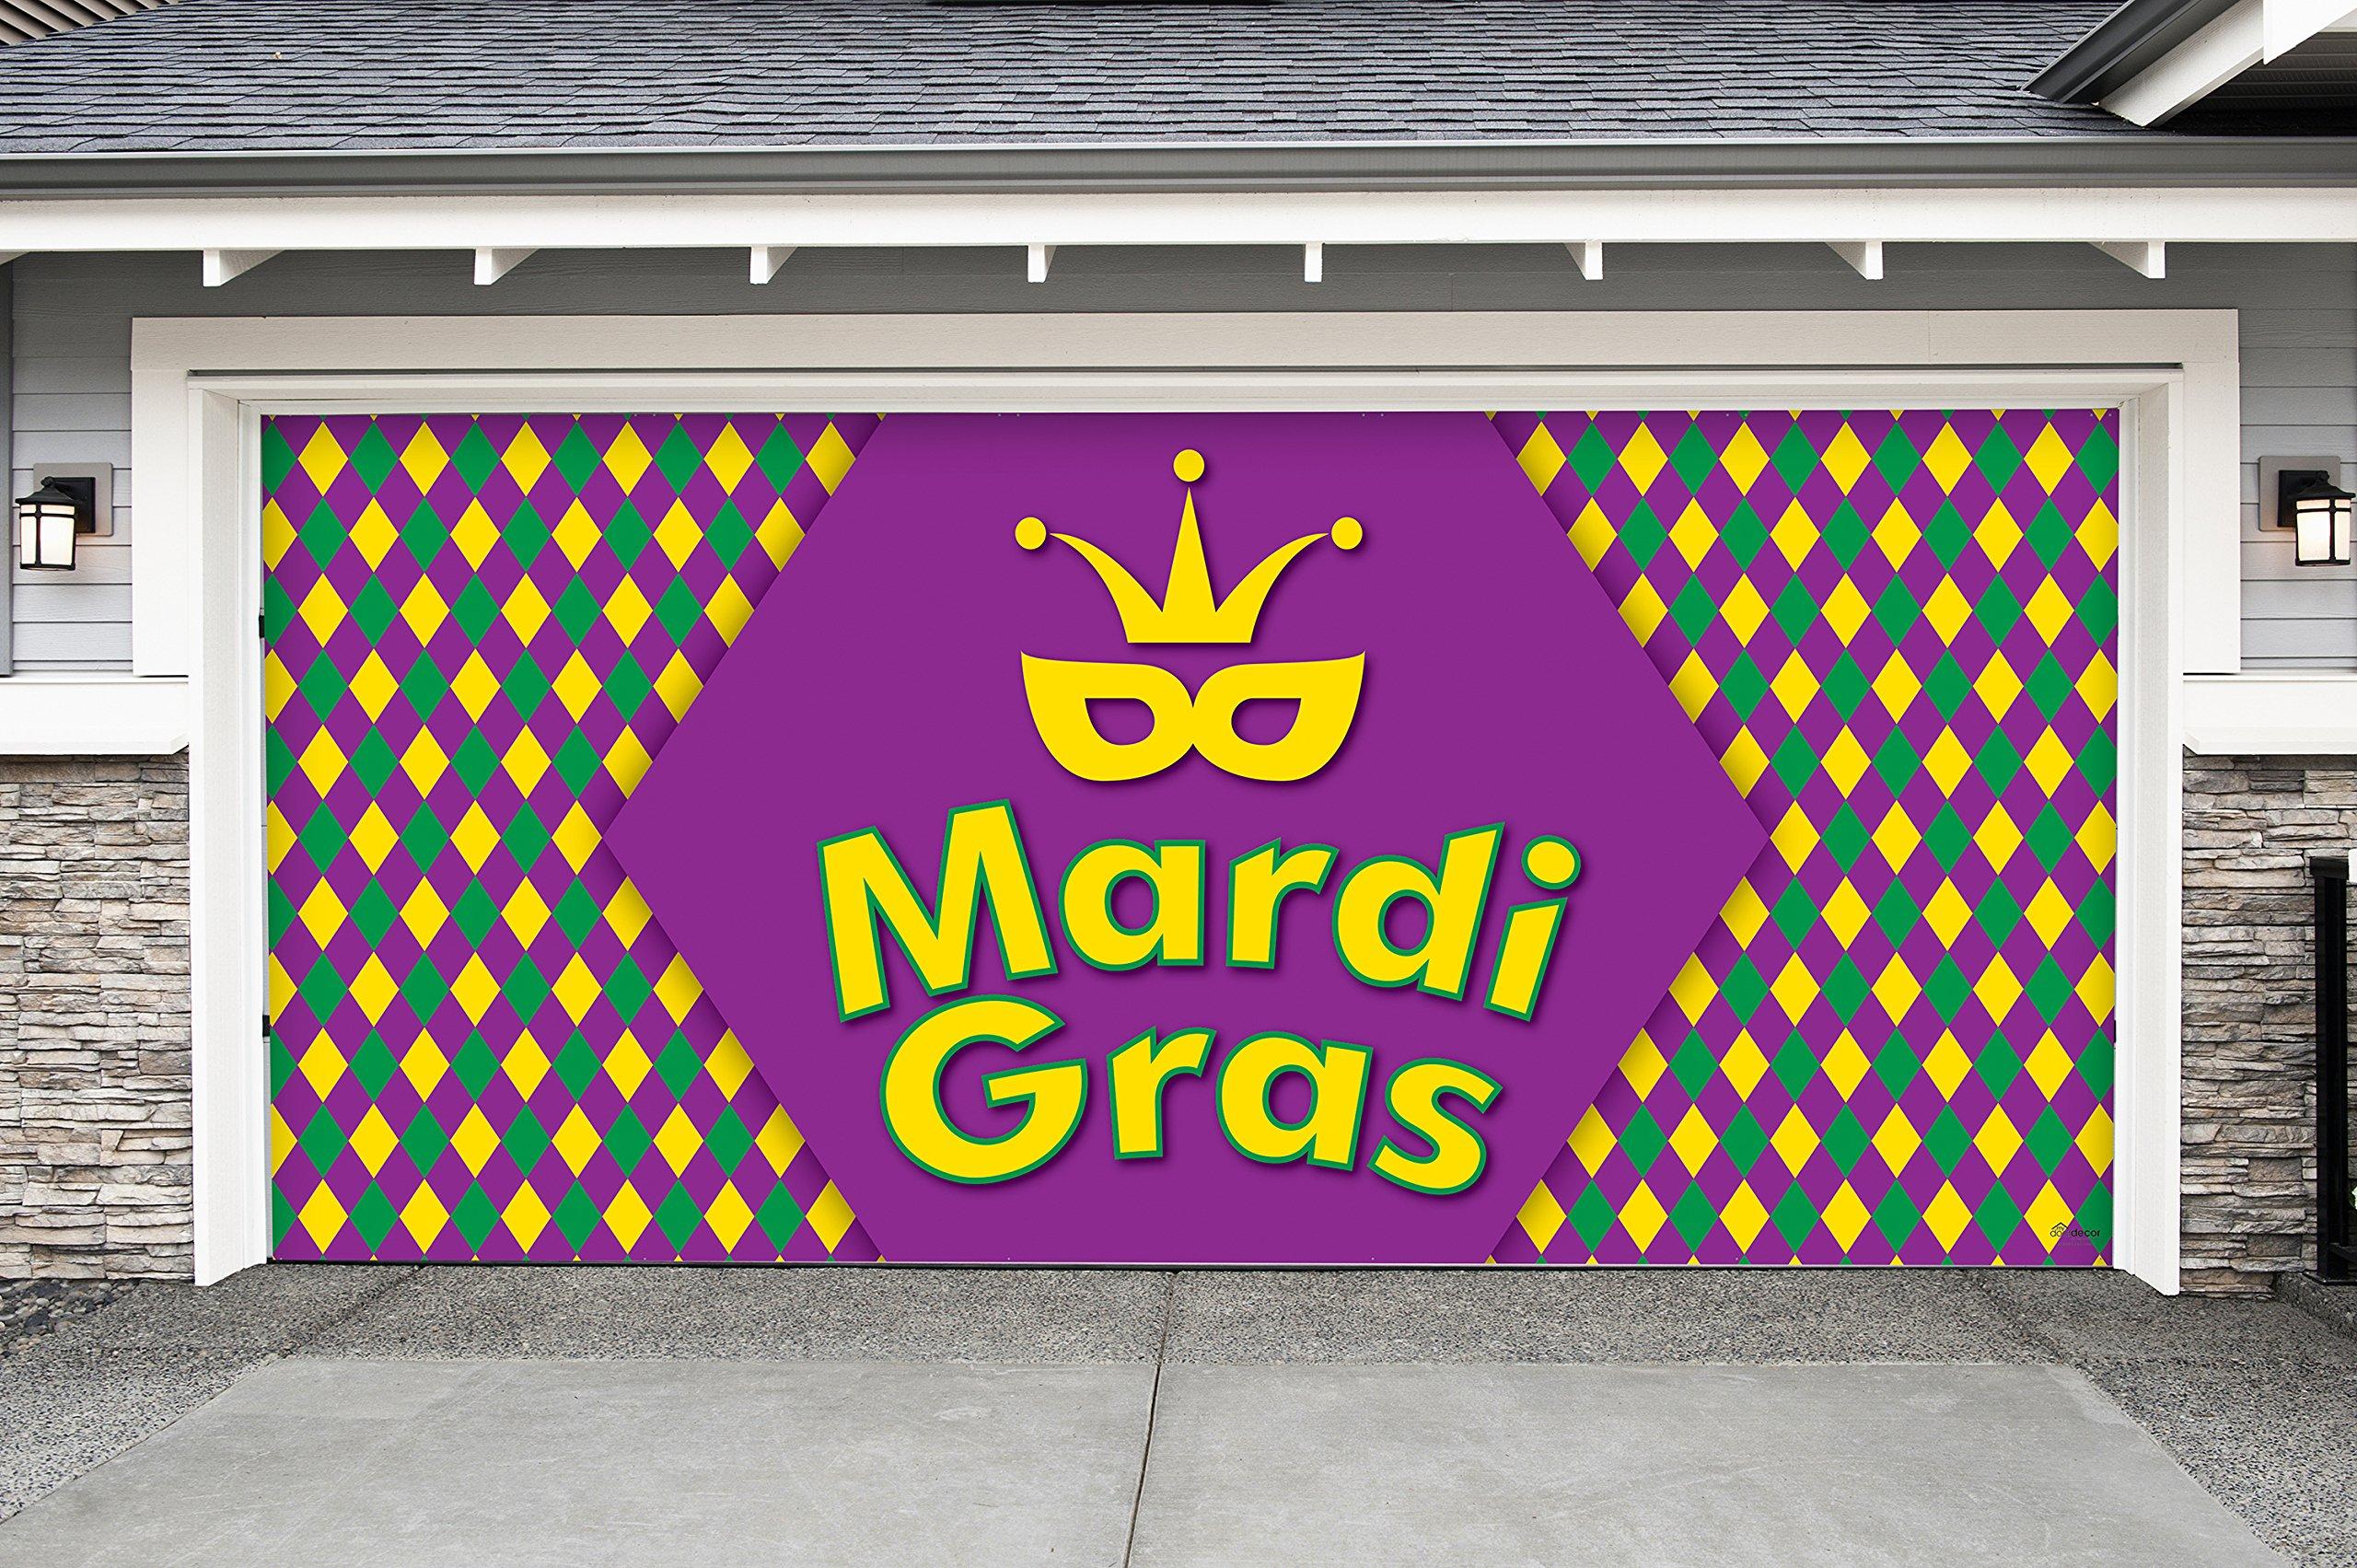 Outdoor Mardi Gras Decorations Garage Door Banner Cover Mural Décoration 7'x16' - Mardi Gras Diamonds - ''The Original Mardi Gras Supplies Holiday Garage Door Banner Decor''